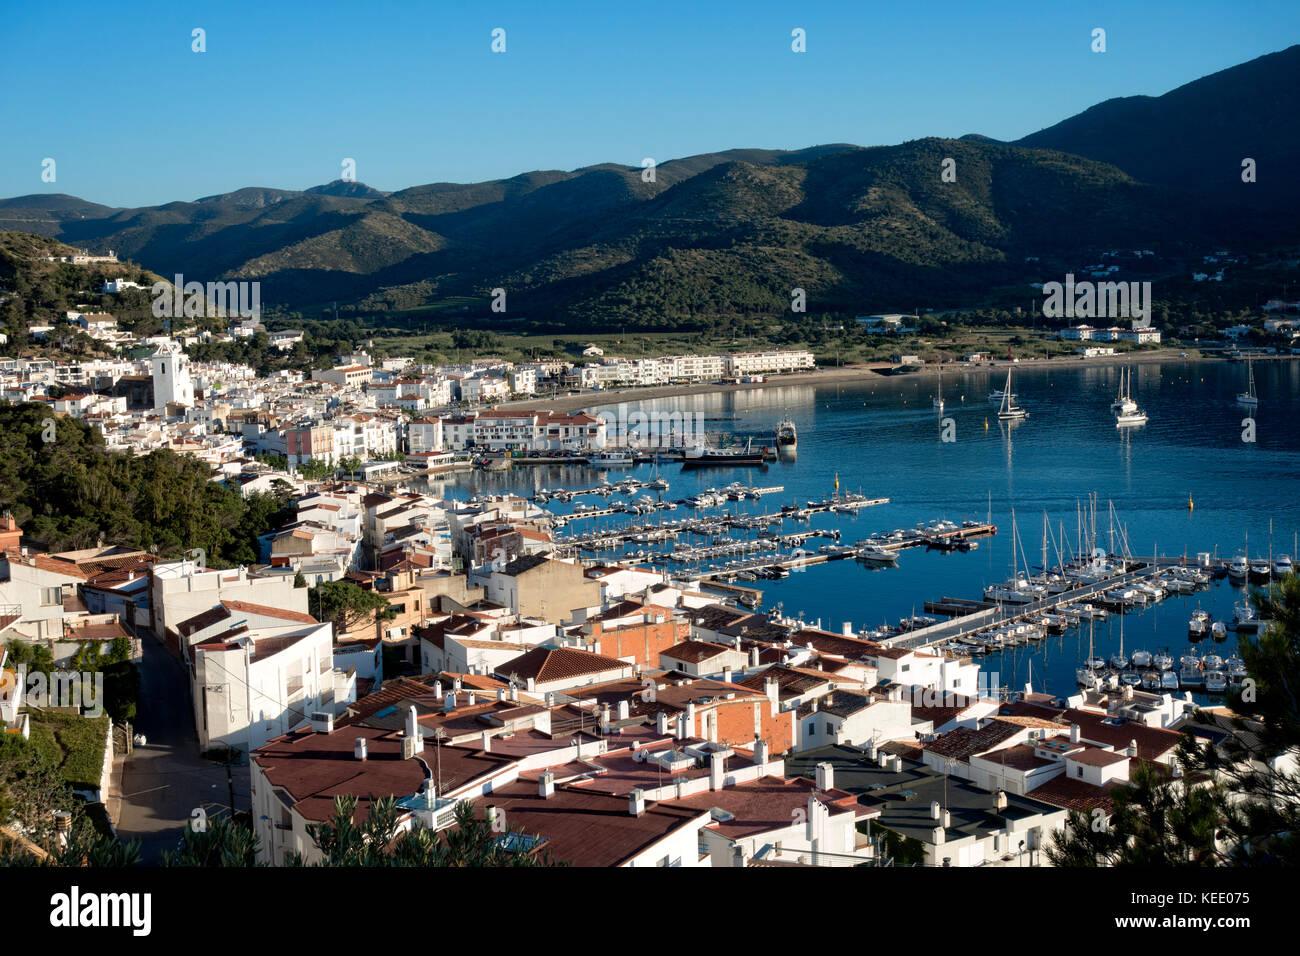 Port de la Selva.Girona.catalunya.Spain - Stock Image